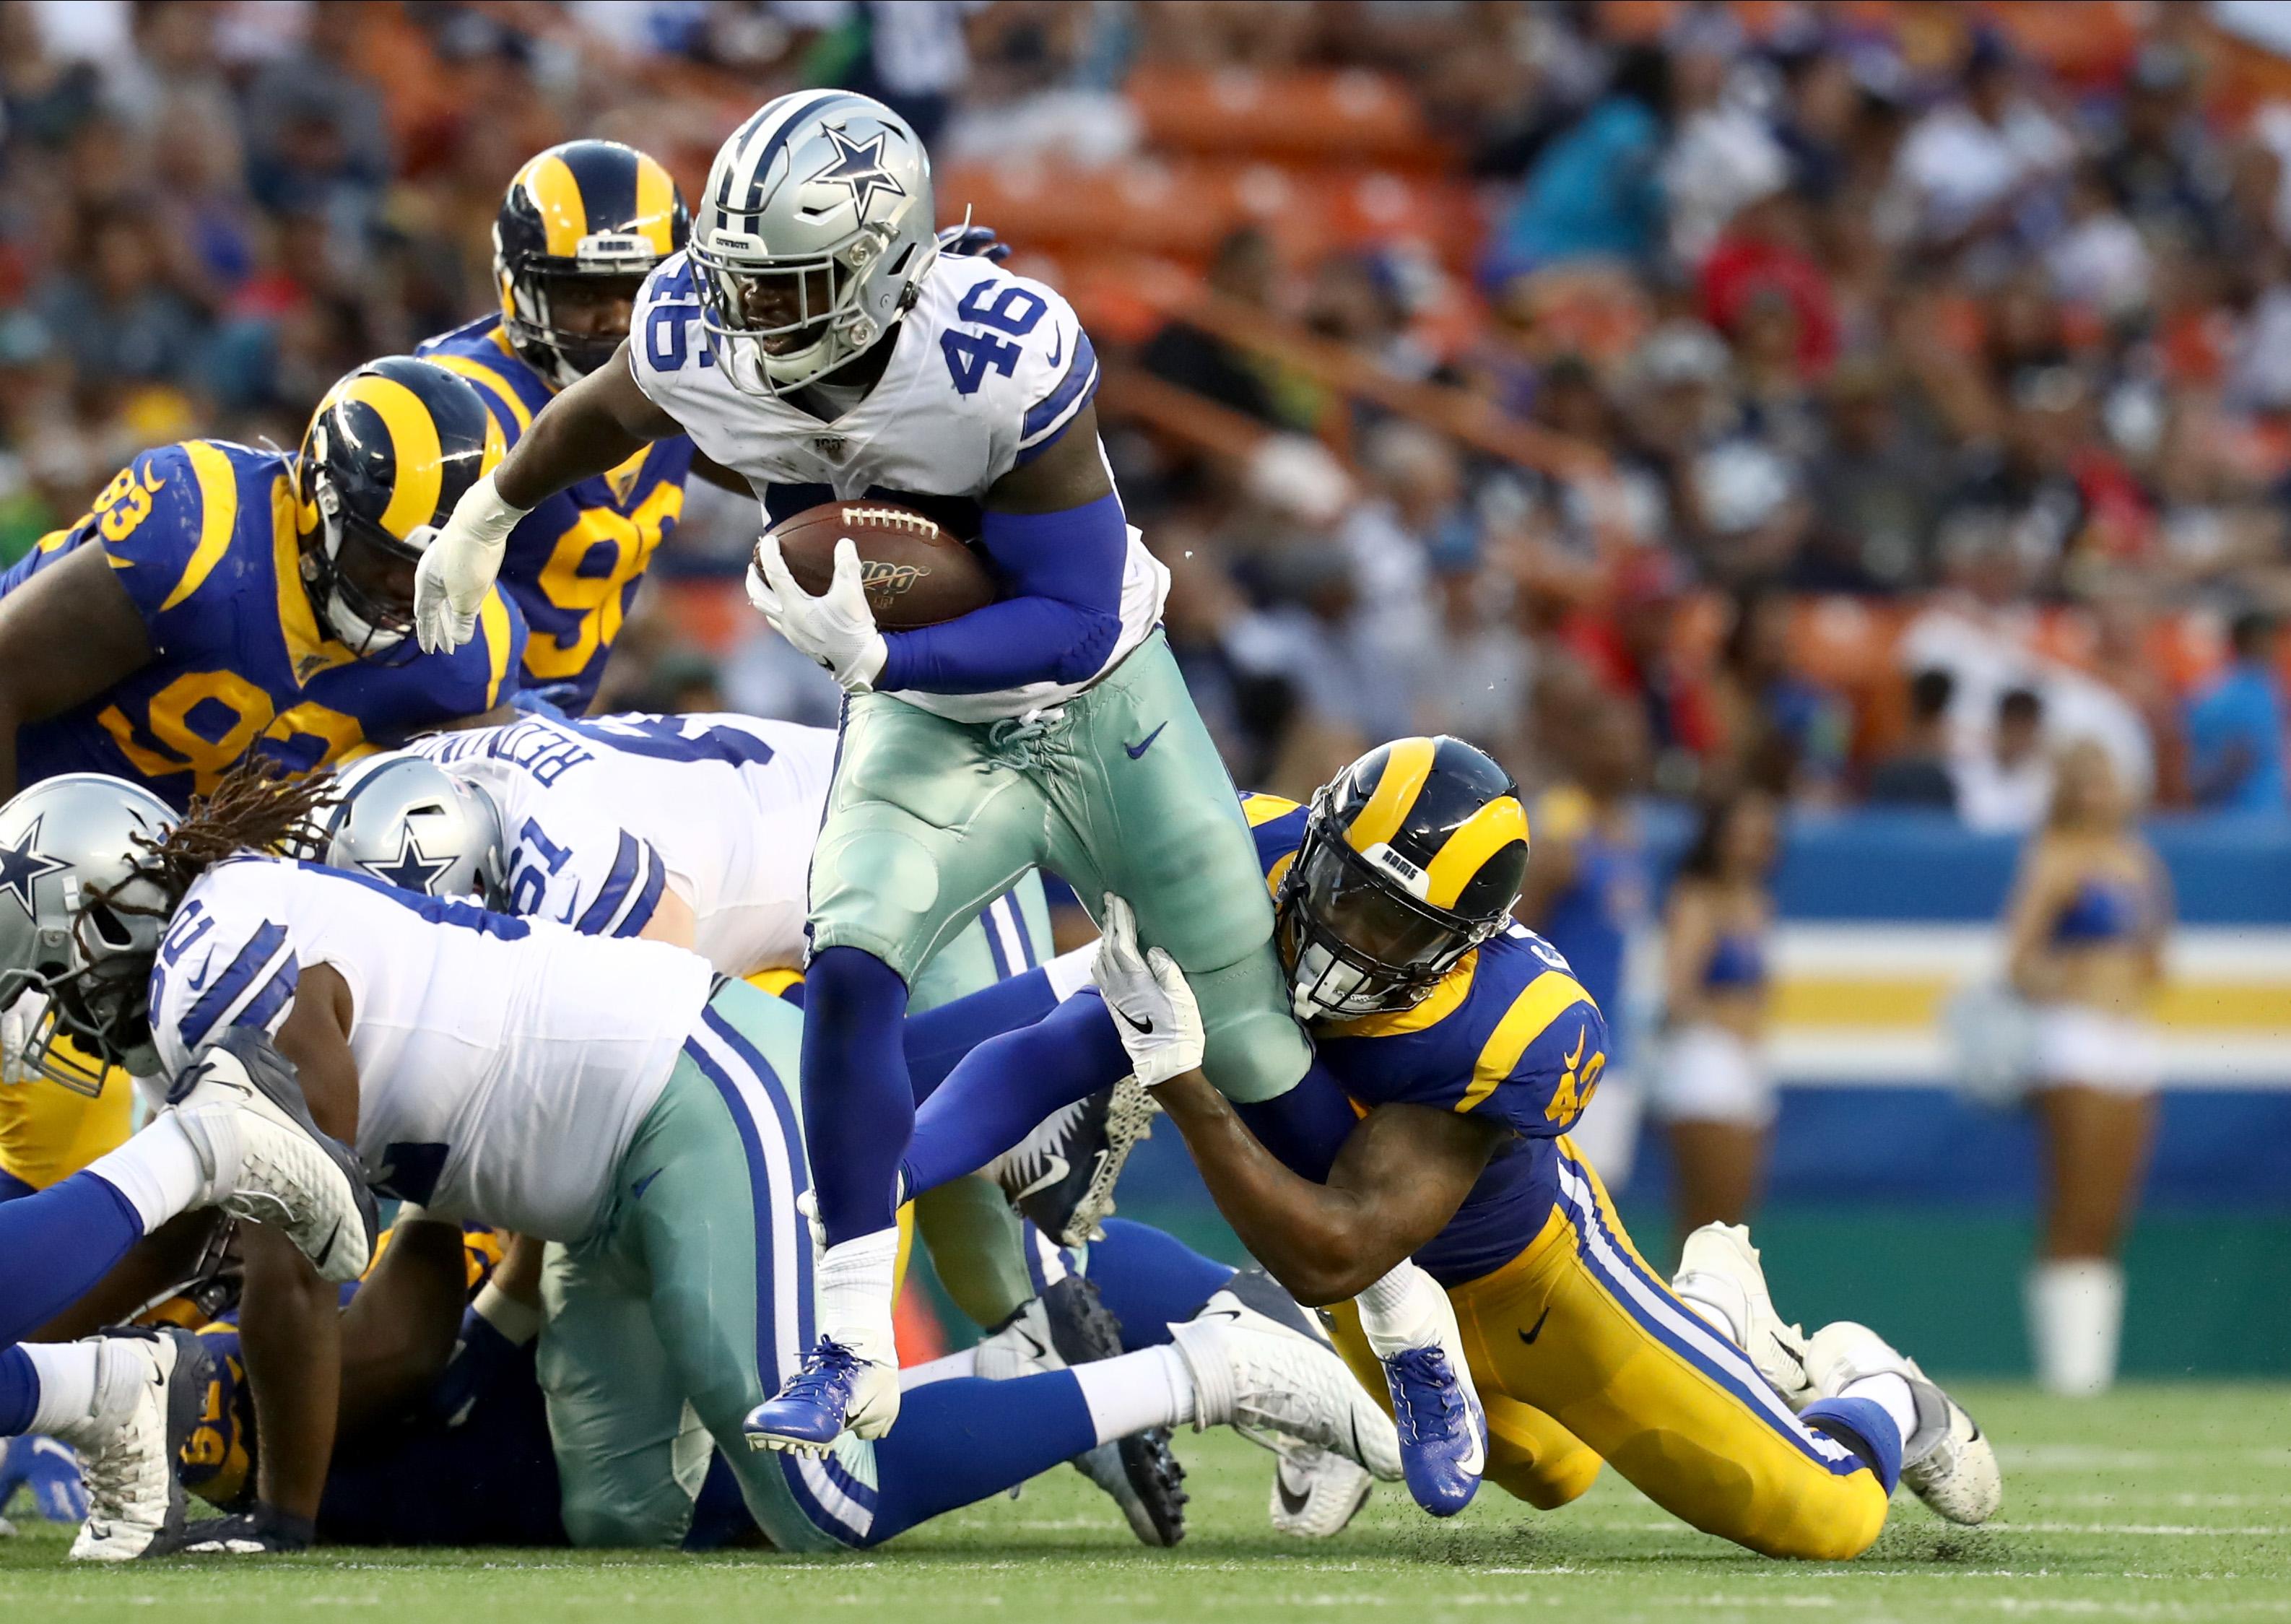 Los Angeles Rams EDGE Josh Carraway brings down Dallas Cowboys RB Jordan Chunn, Aug. 17, 2019.